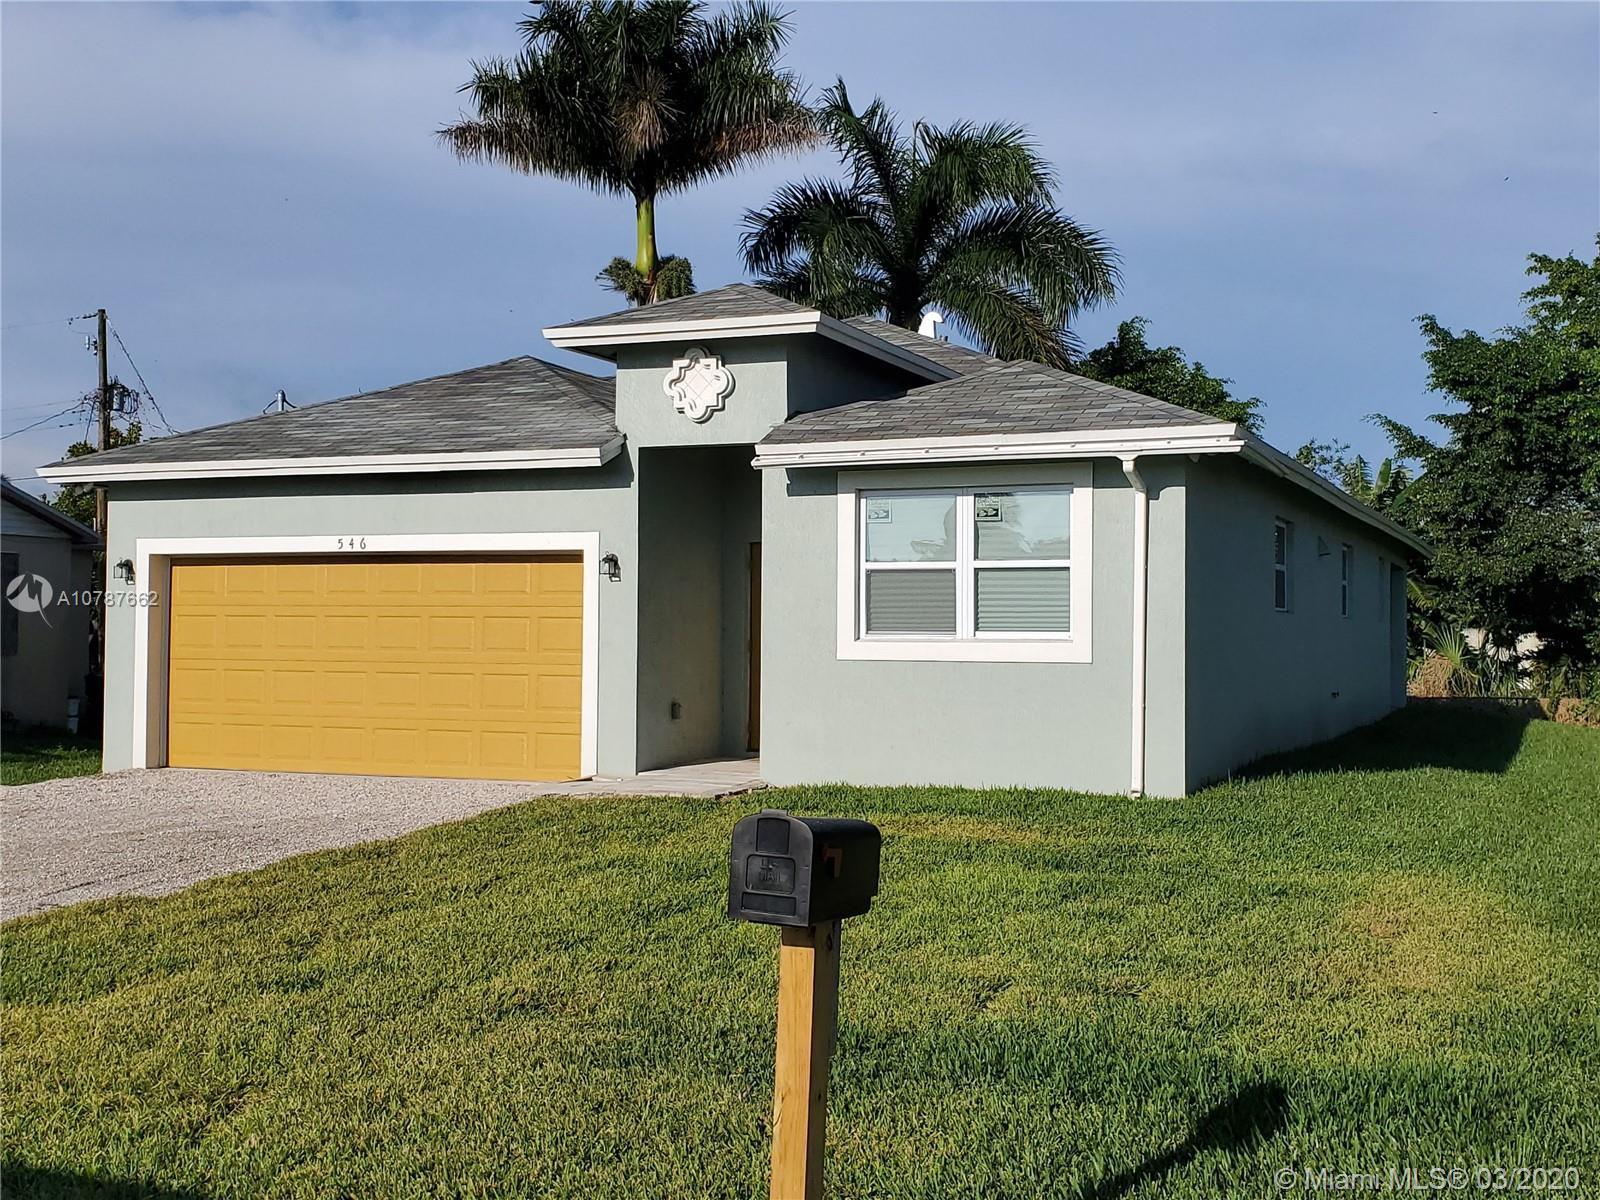 546 SE 6th Drive, Belle Glade, FL 33430